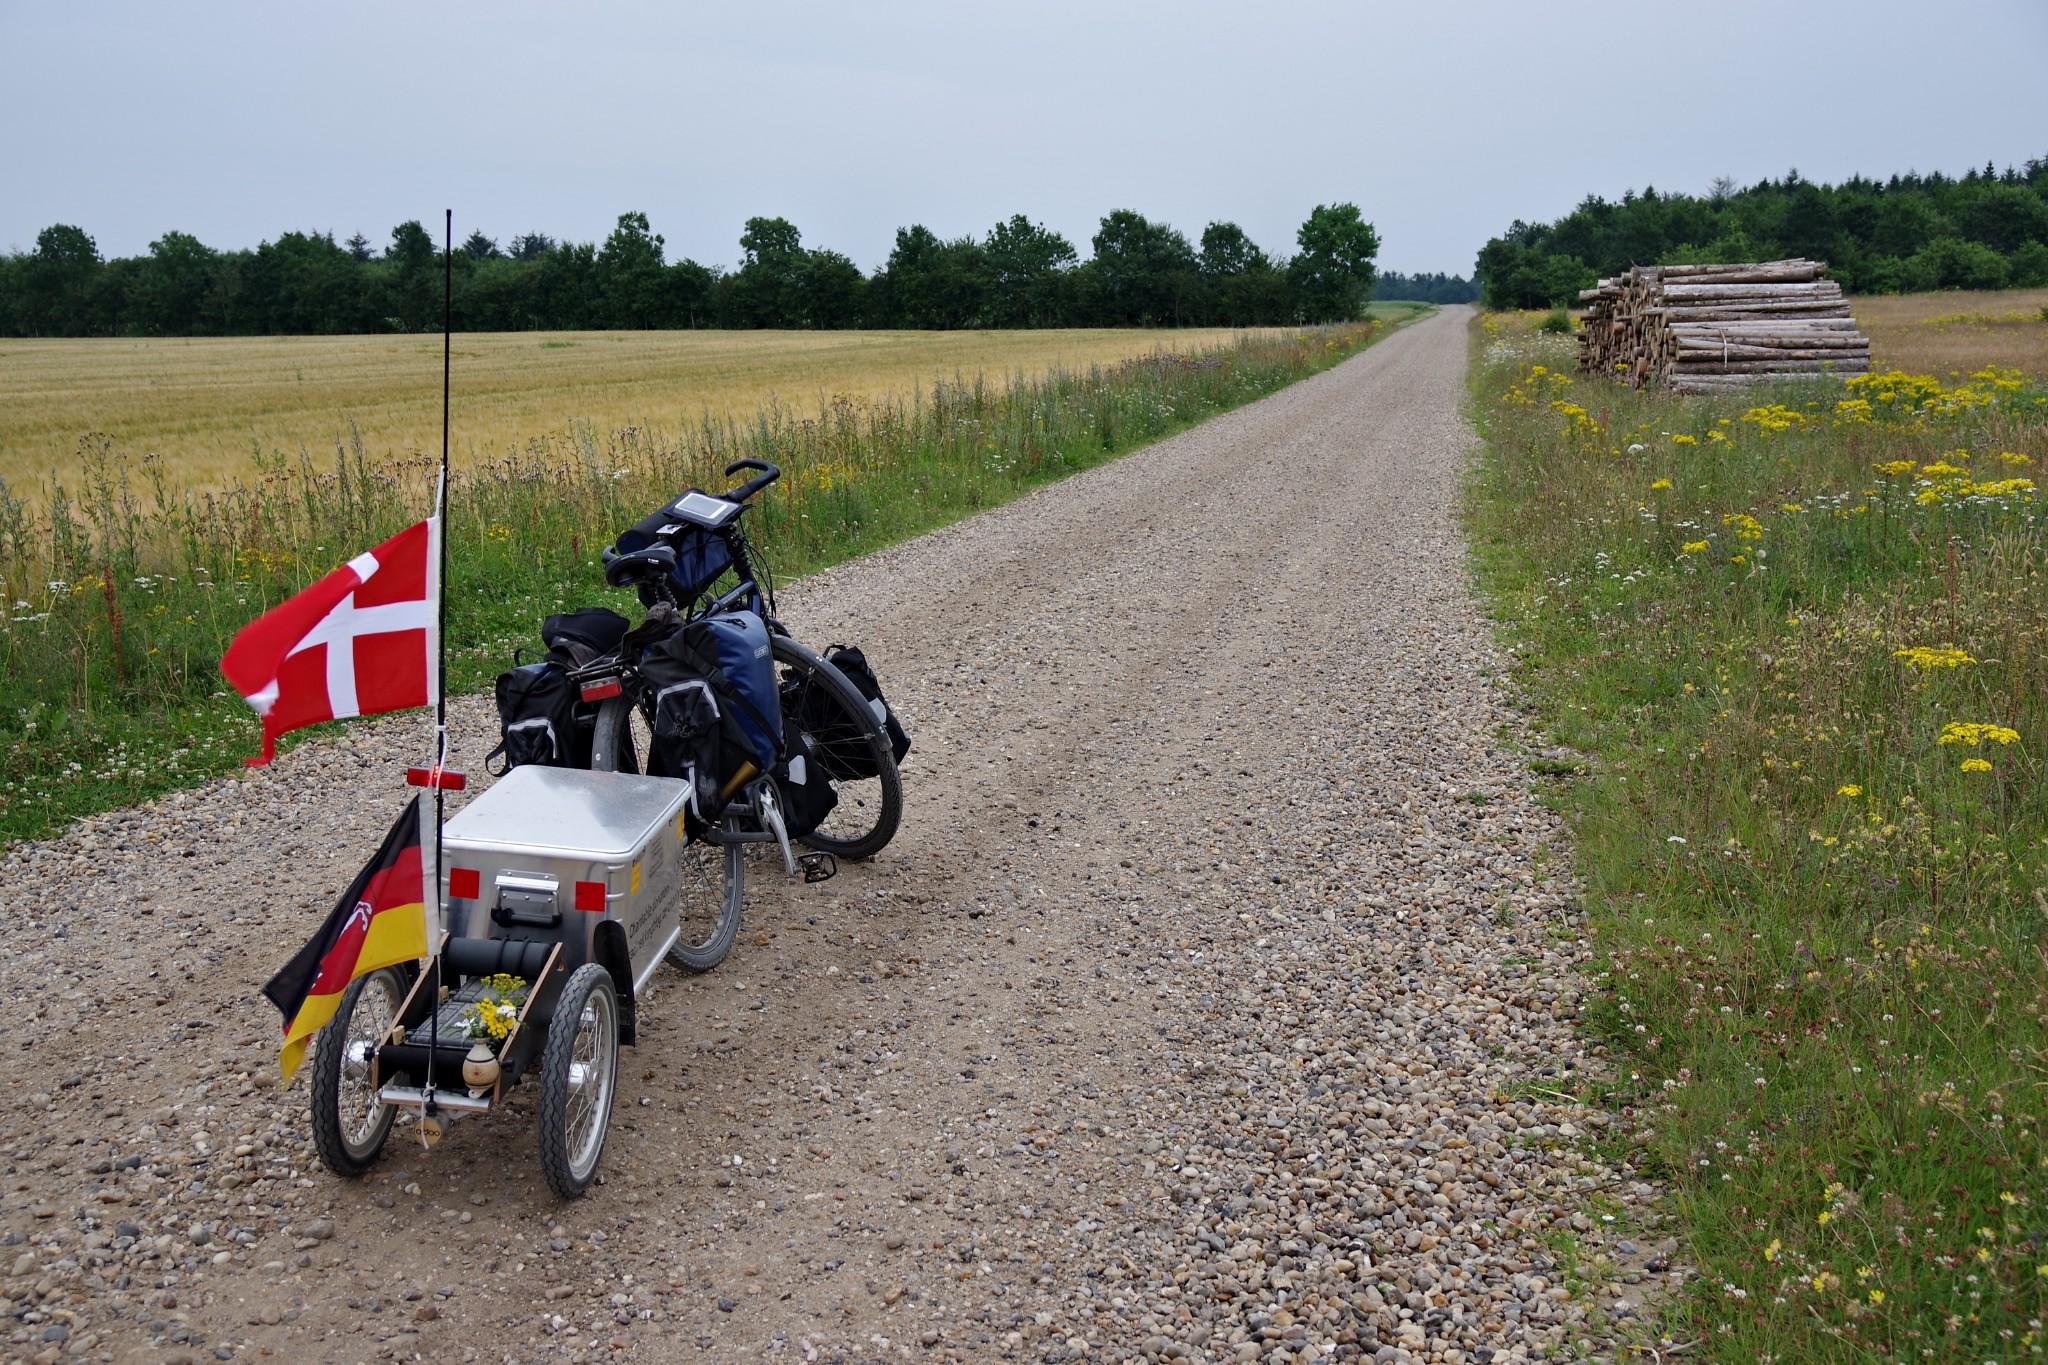 Dänemark, 20.07.2017